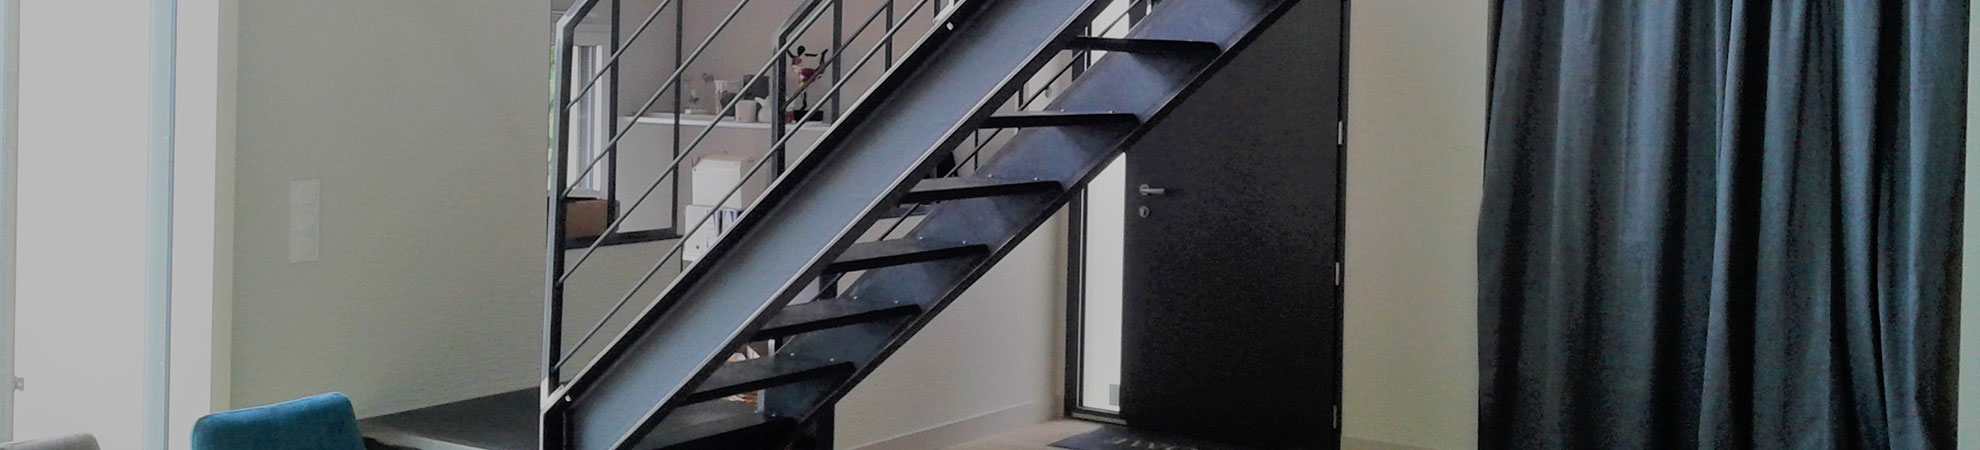 Metal 3D 49 Metallerie escalier La bohalle Angers